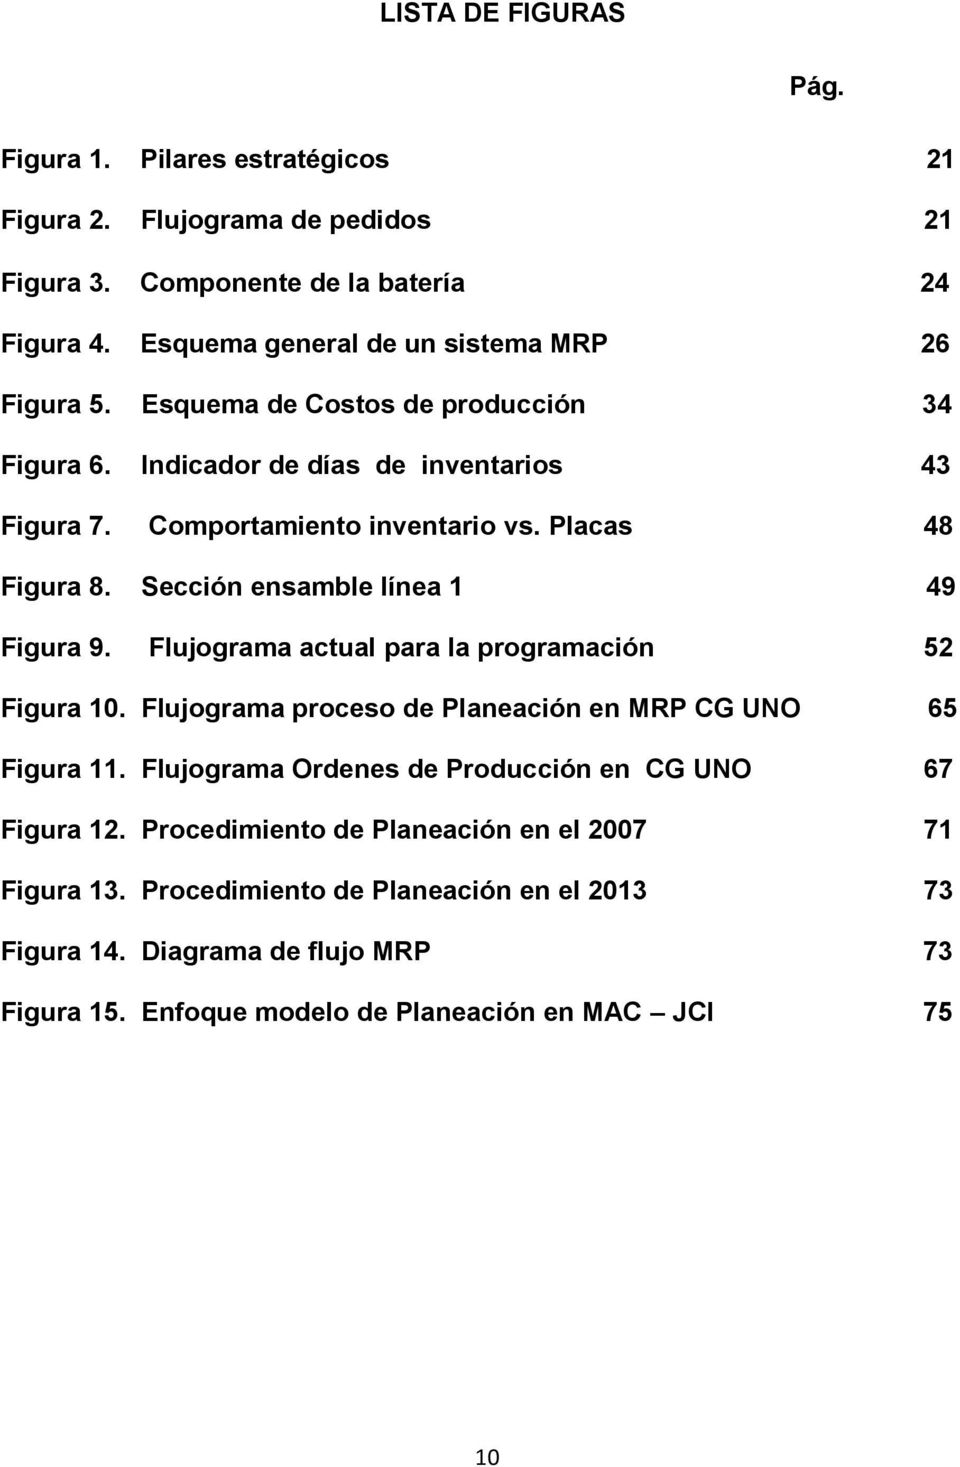 hight resolution of placas 48 figura 8 secci n ensamble l nea 1 49 figura 9 flujograma actual para